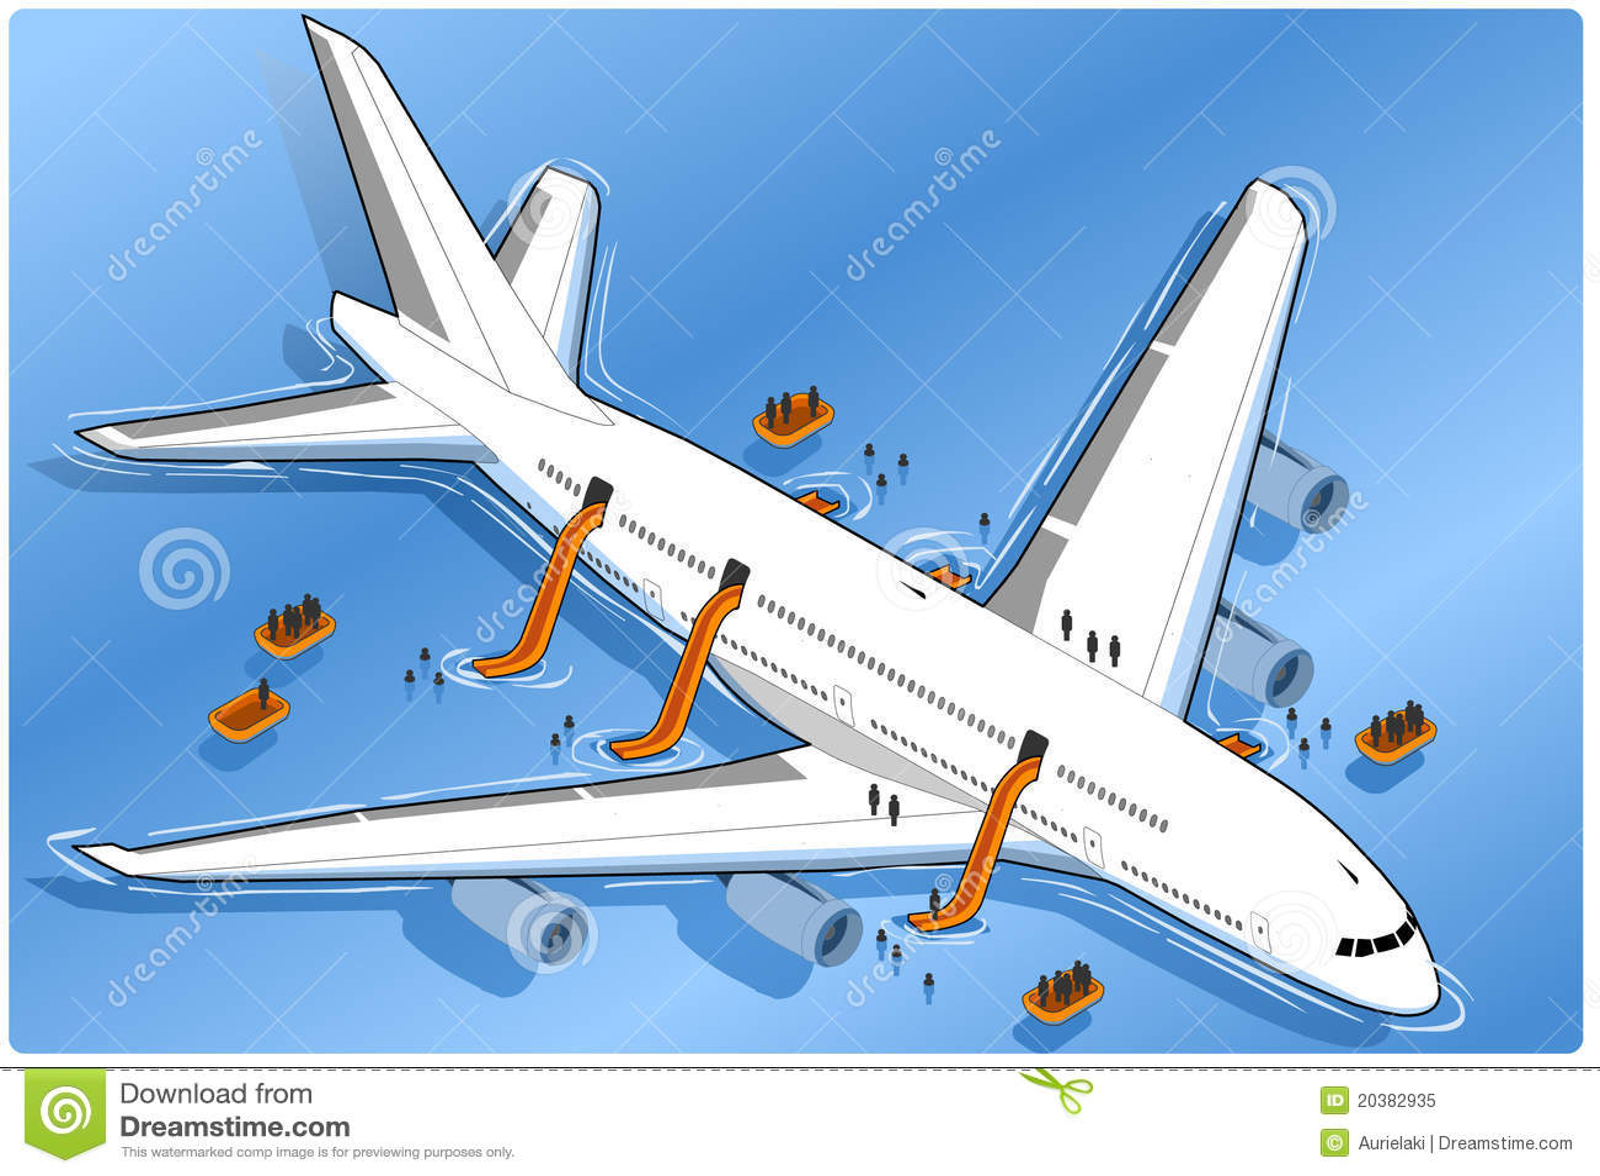 Isometric plane crash, ditched